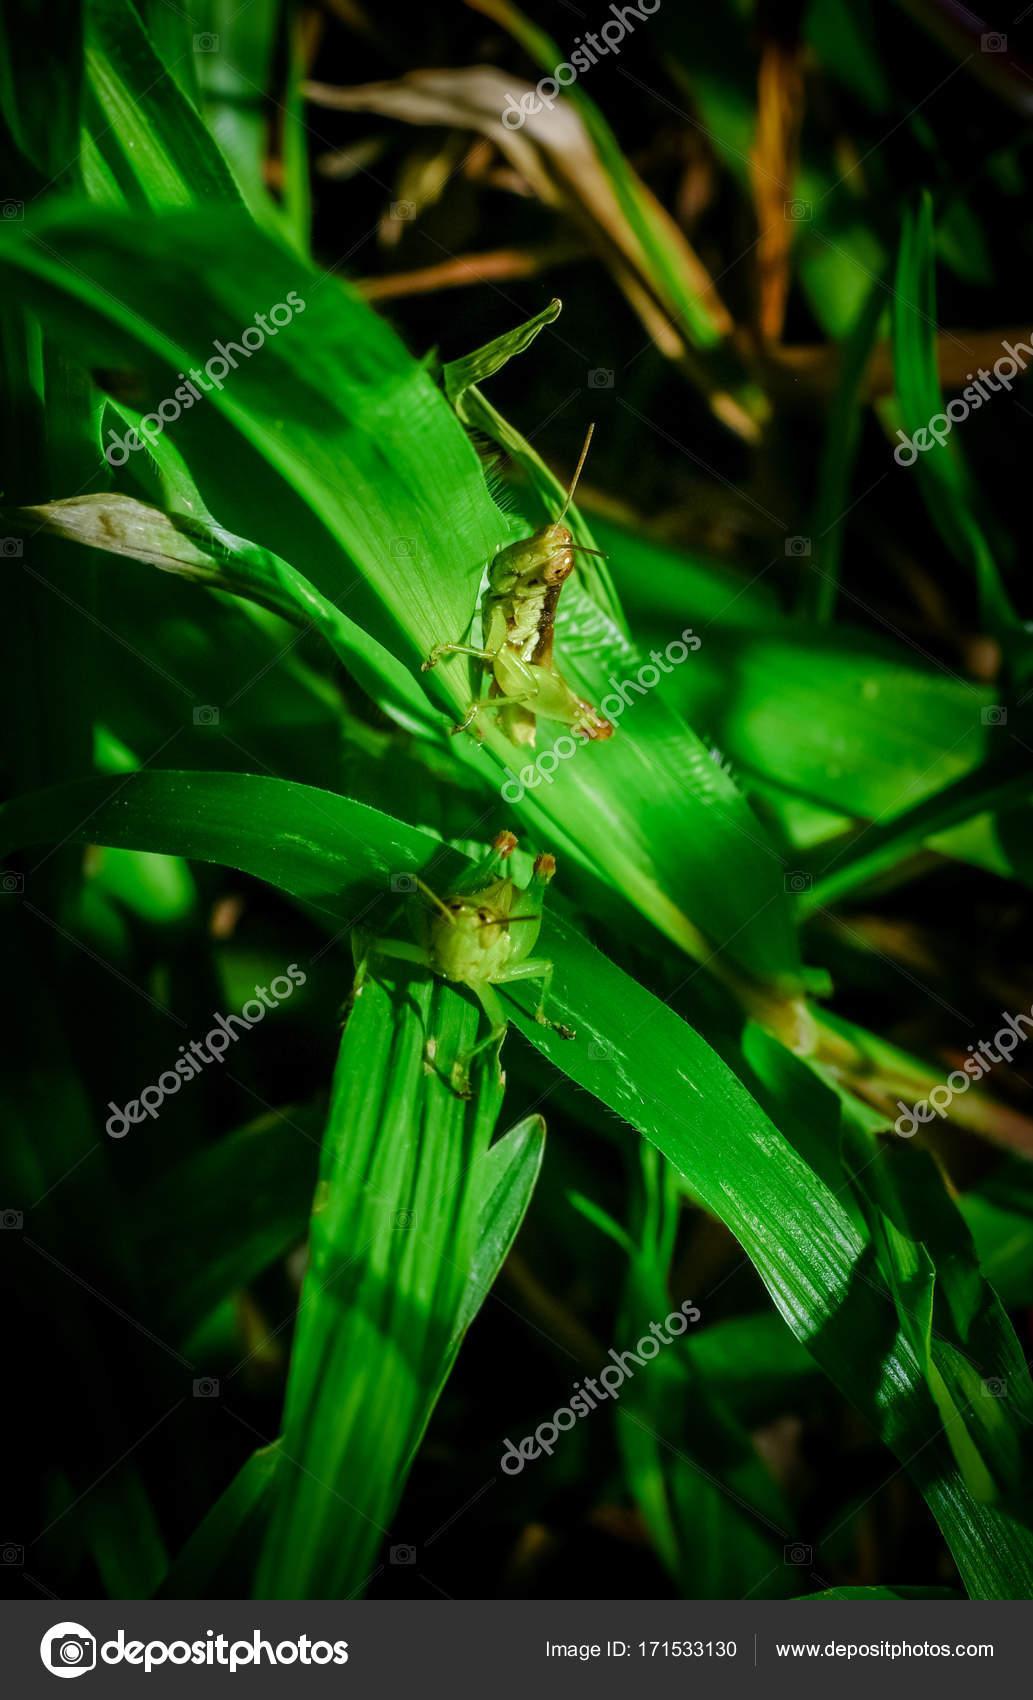 saltamontes en rama — Foto de stock © pixbox77 #171533130